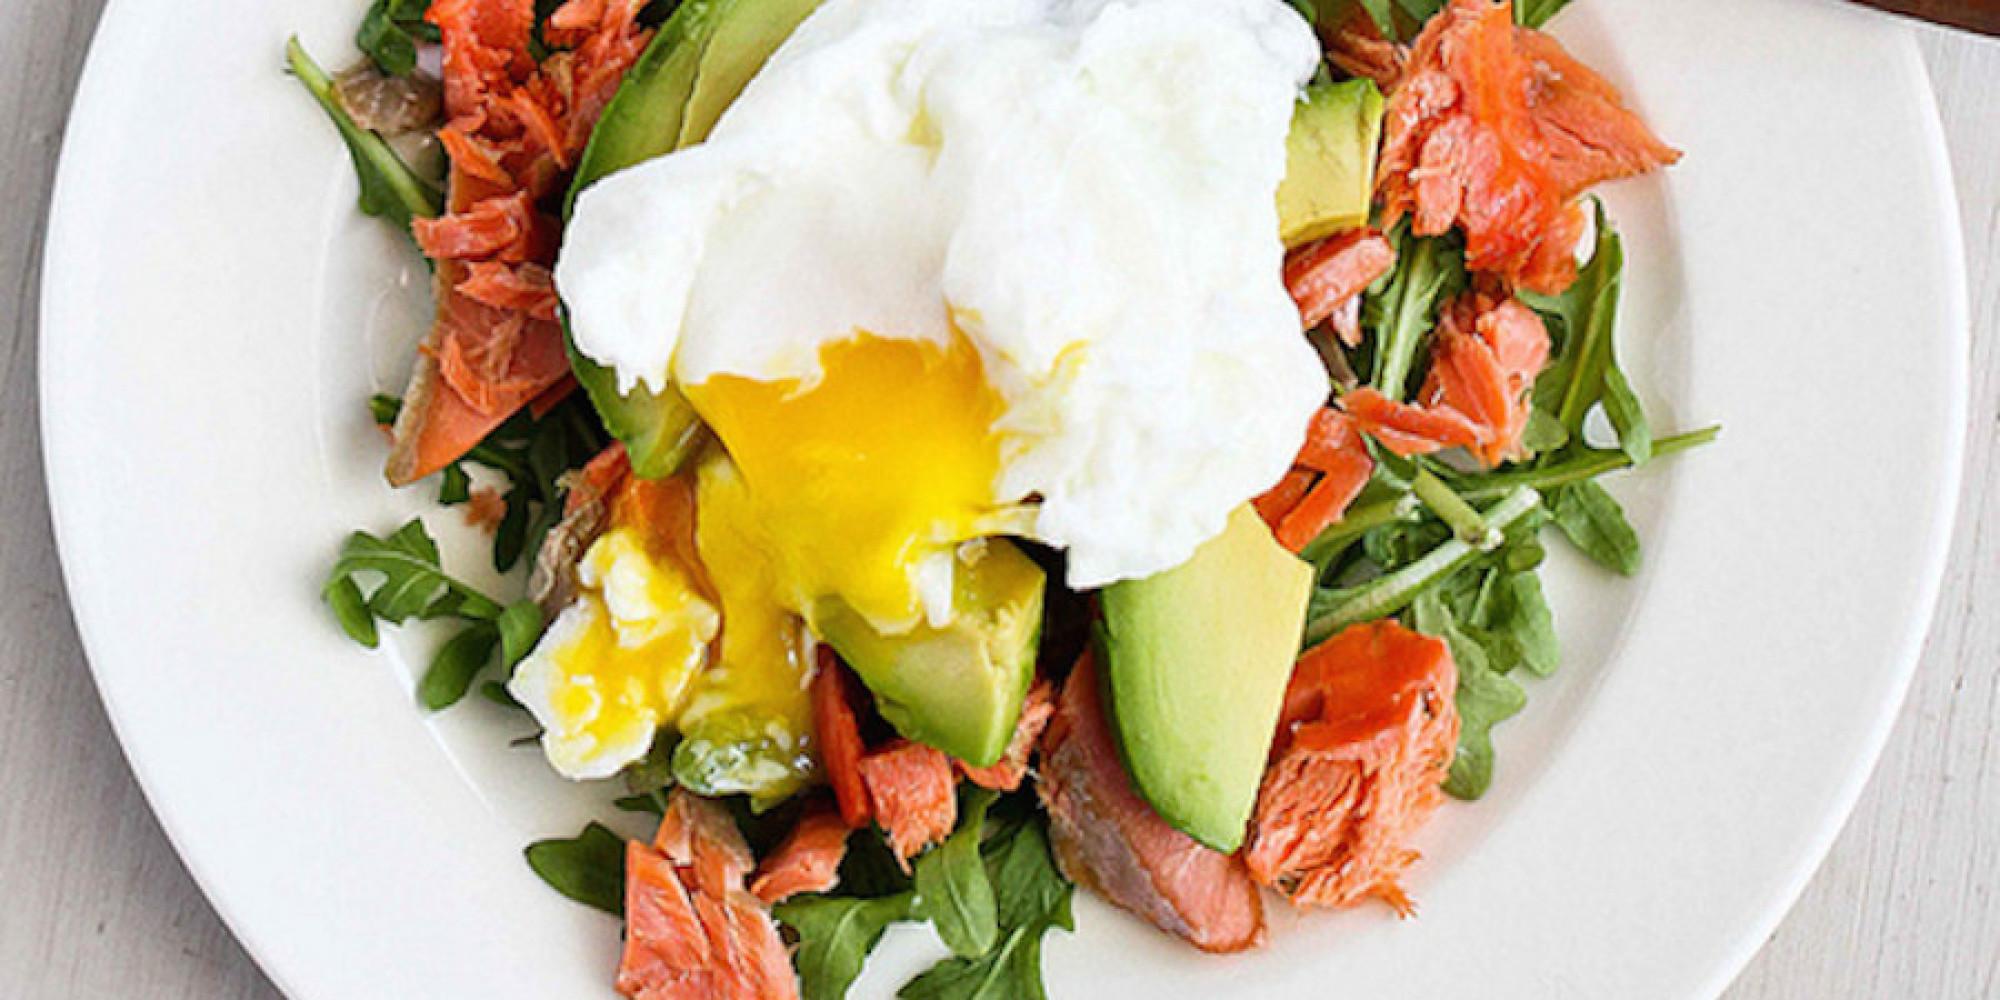 Healthy Avocado Breakfast Avocado Breakfast Recipes